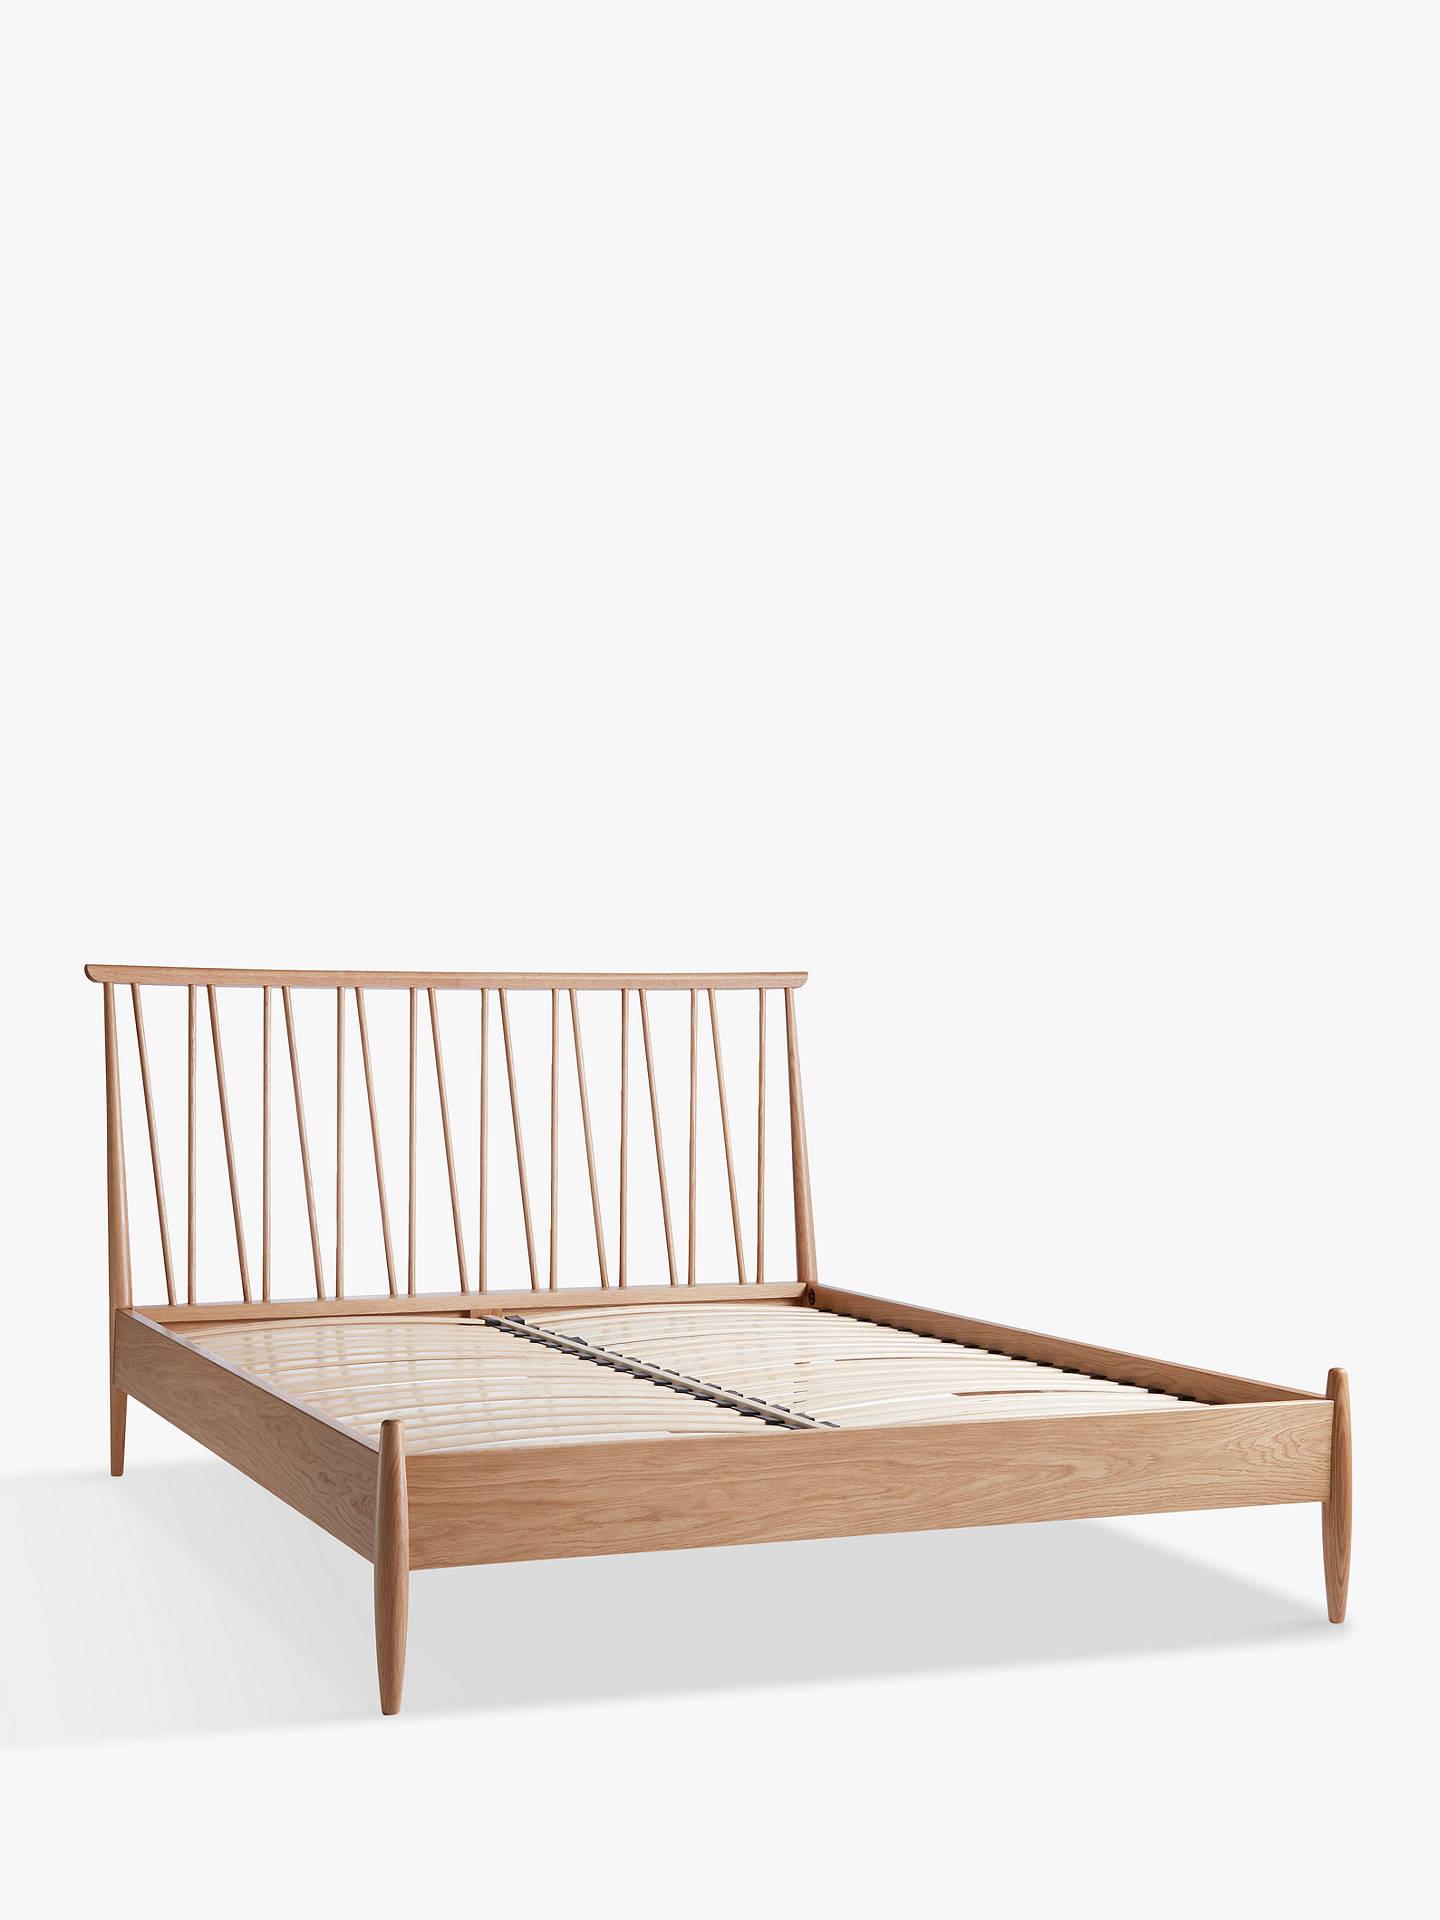 Buyercol for john lewis shalstone bed frame oak king size online at johnlewis